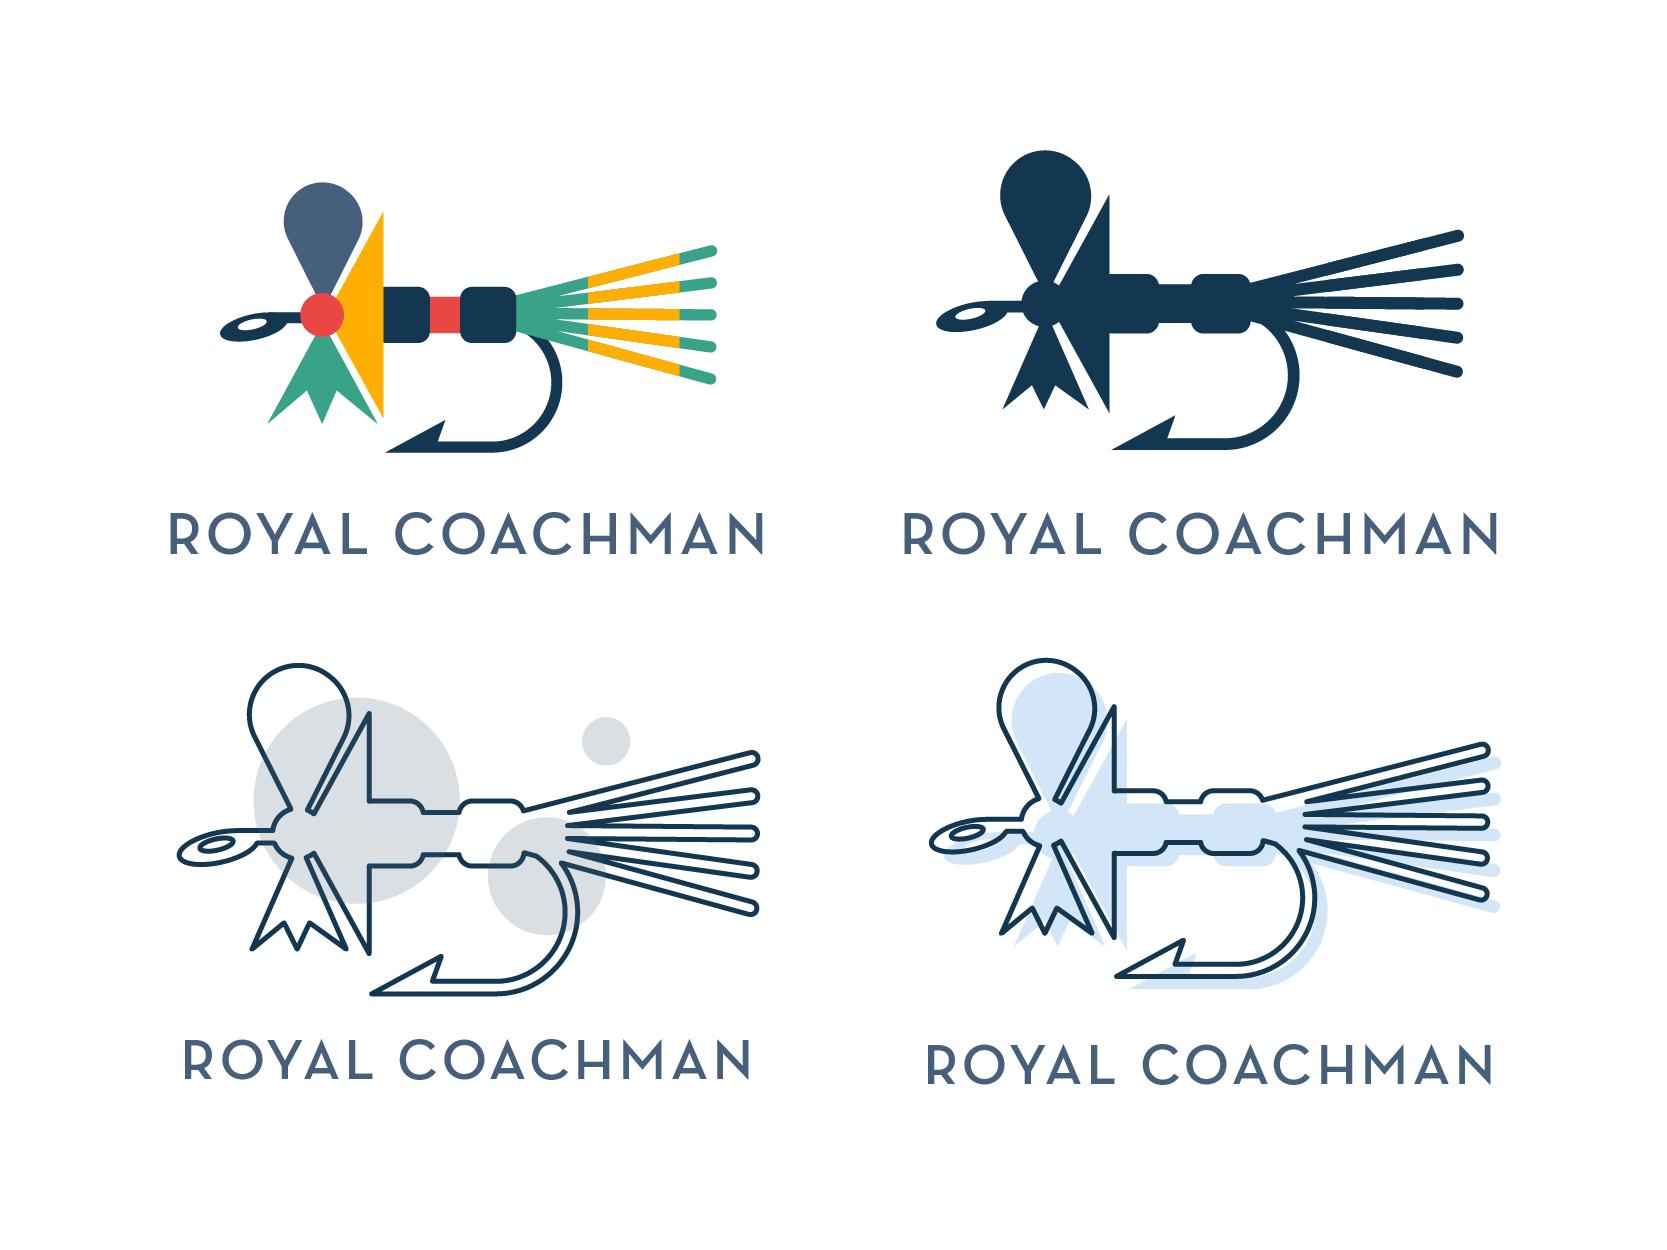 Royal coachman options 01